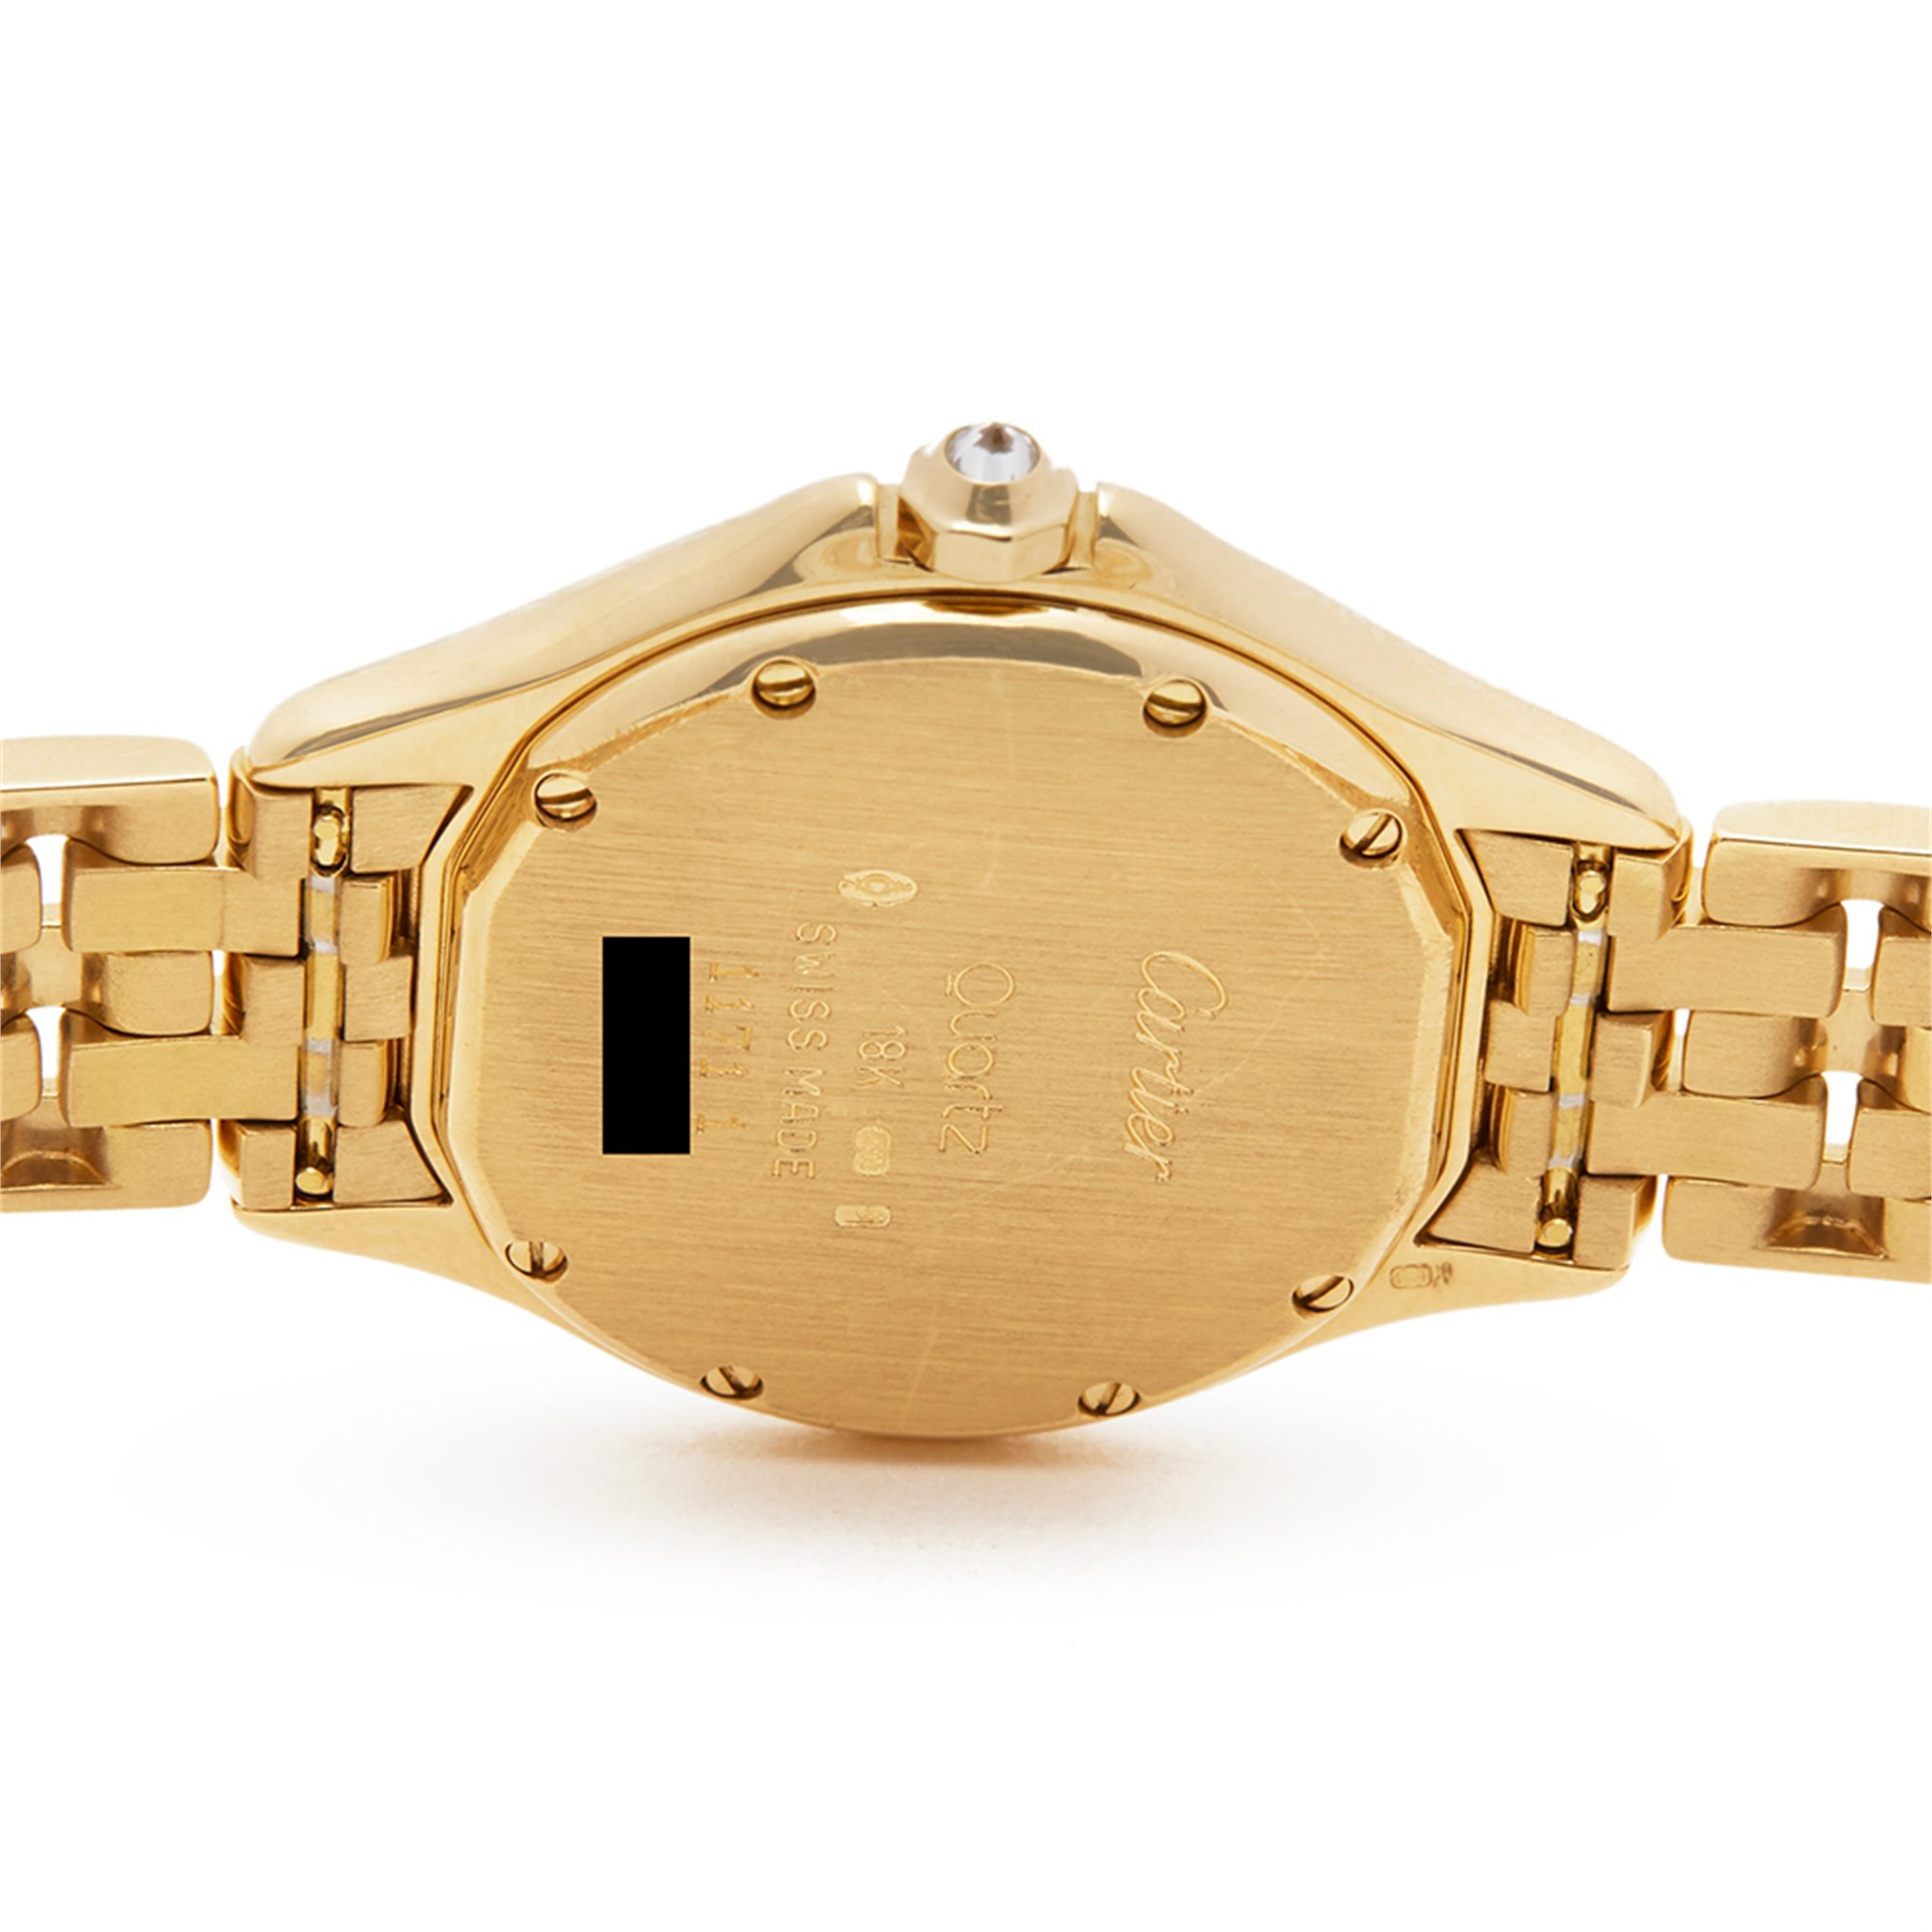 Cartier Panthère Cougar Diamond 18K Yellow Gold WF8008B9 or 1171